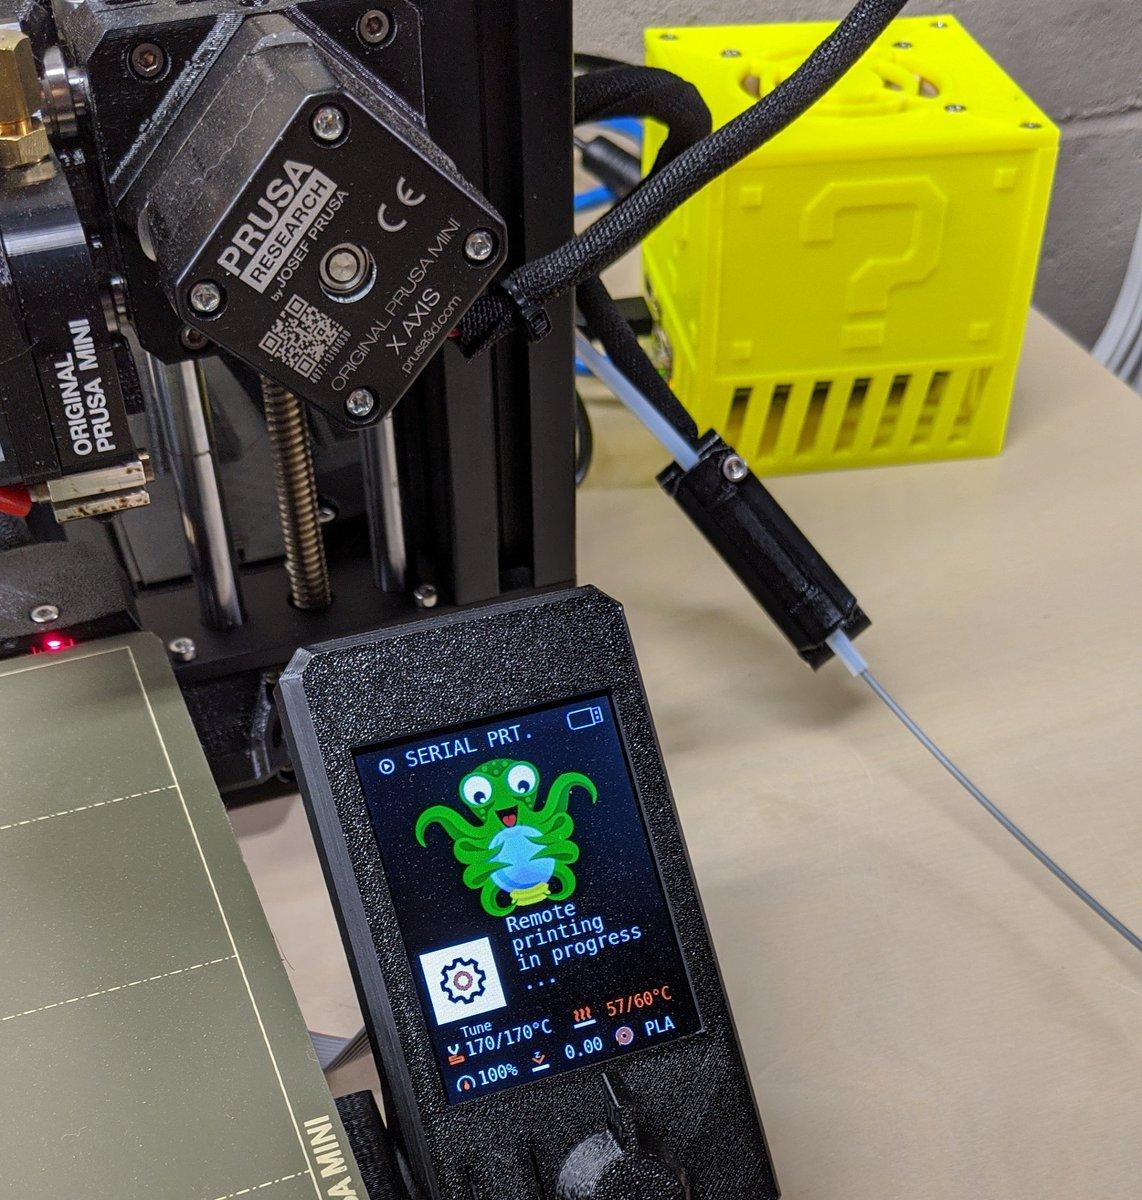 Prusa Mini officially Octofi'd  #prusa3d #octiprint #octopi #RaspberryPi #pi4 #prusamini #3dp #3dprinter #3dprinting #maker